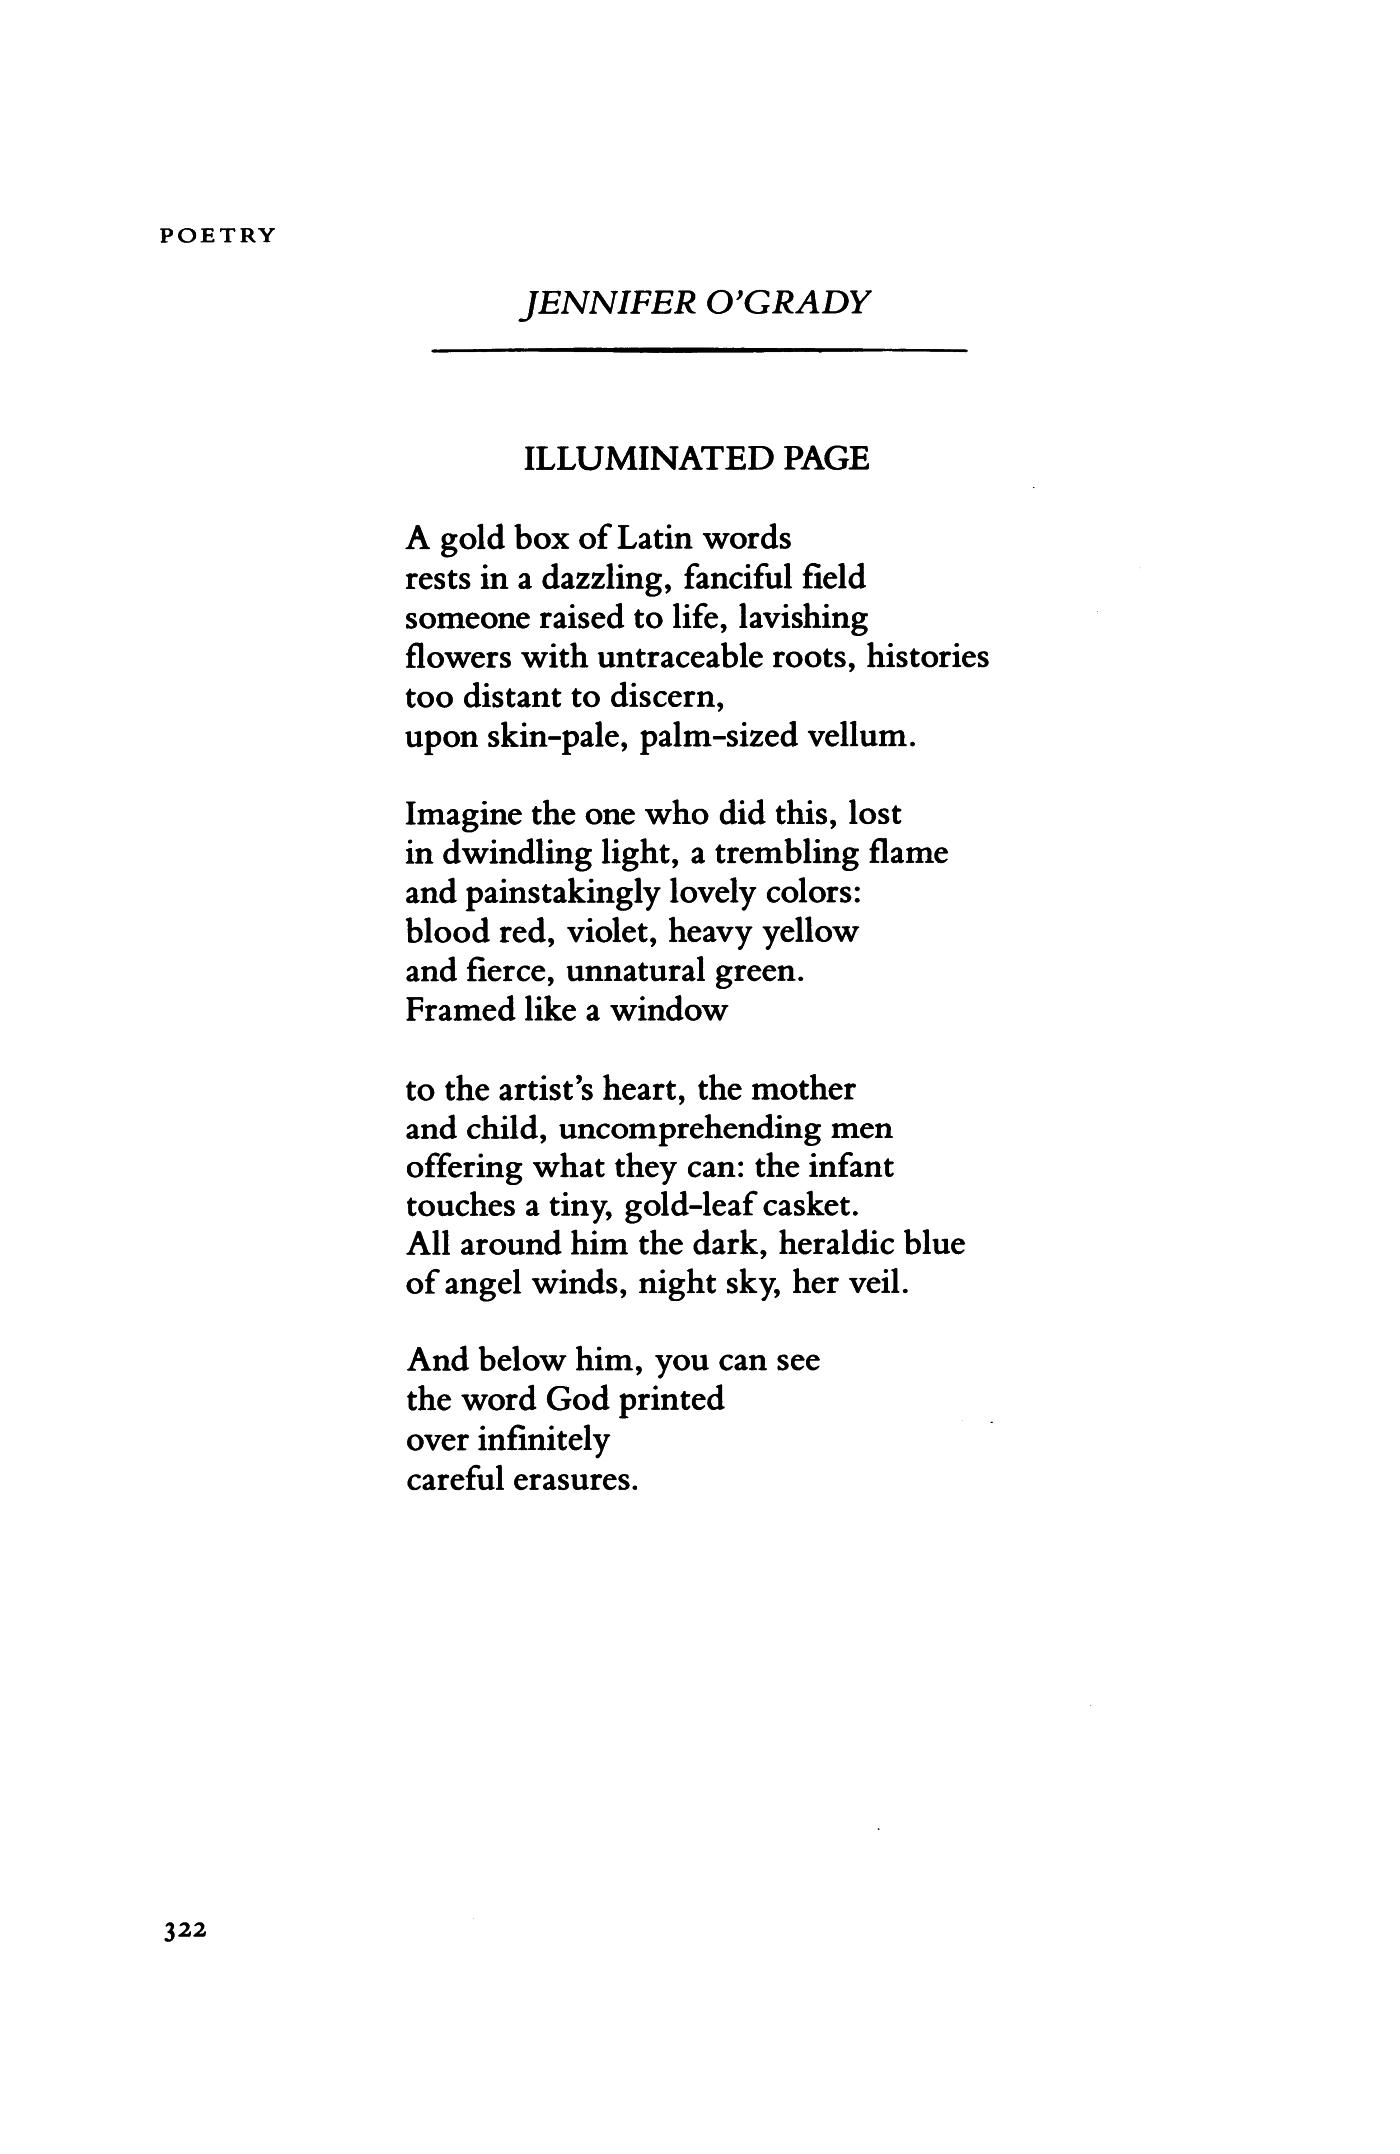 Illuminated Page by Jennifer O'Grady | Poetry Magazine